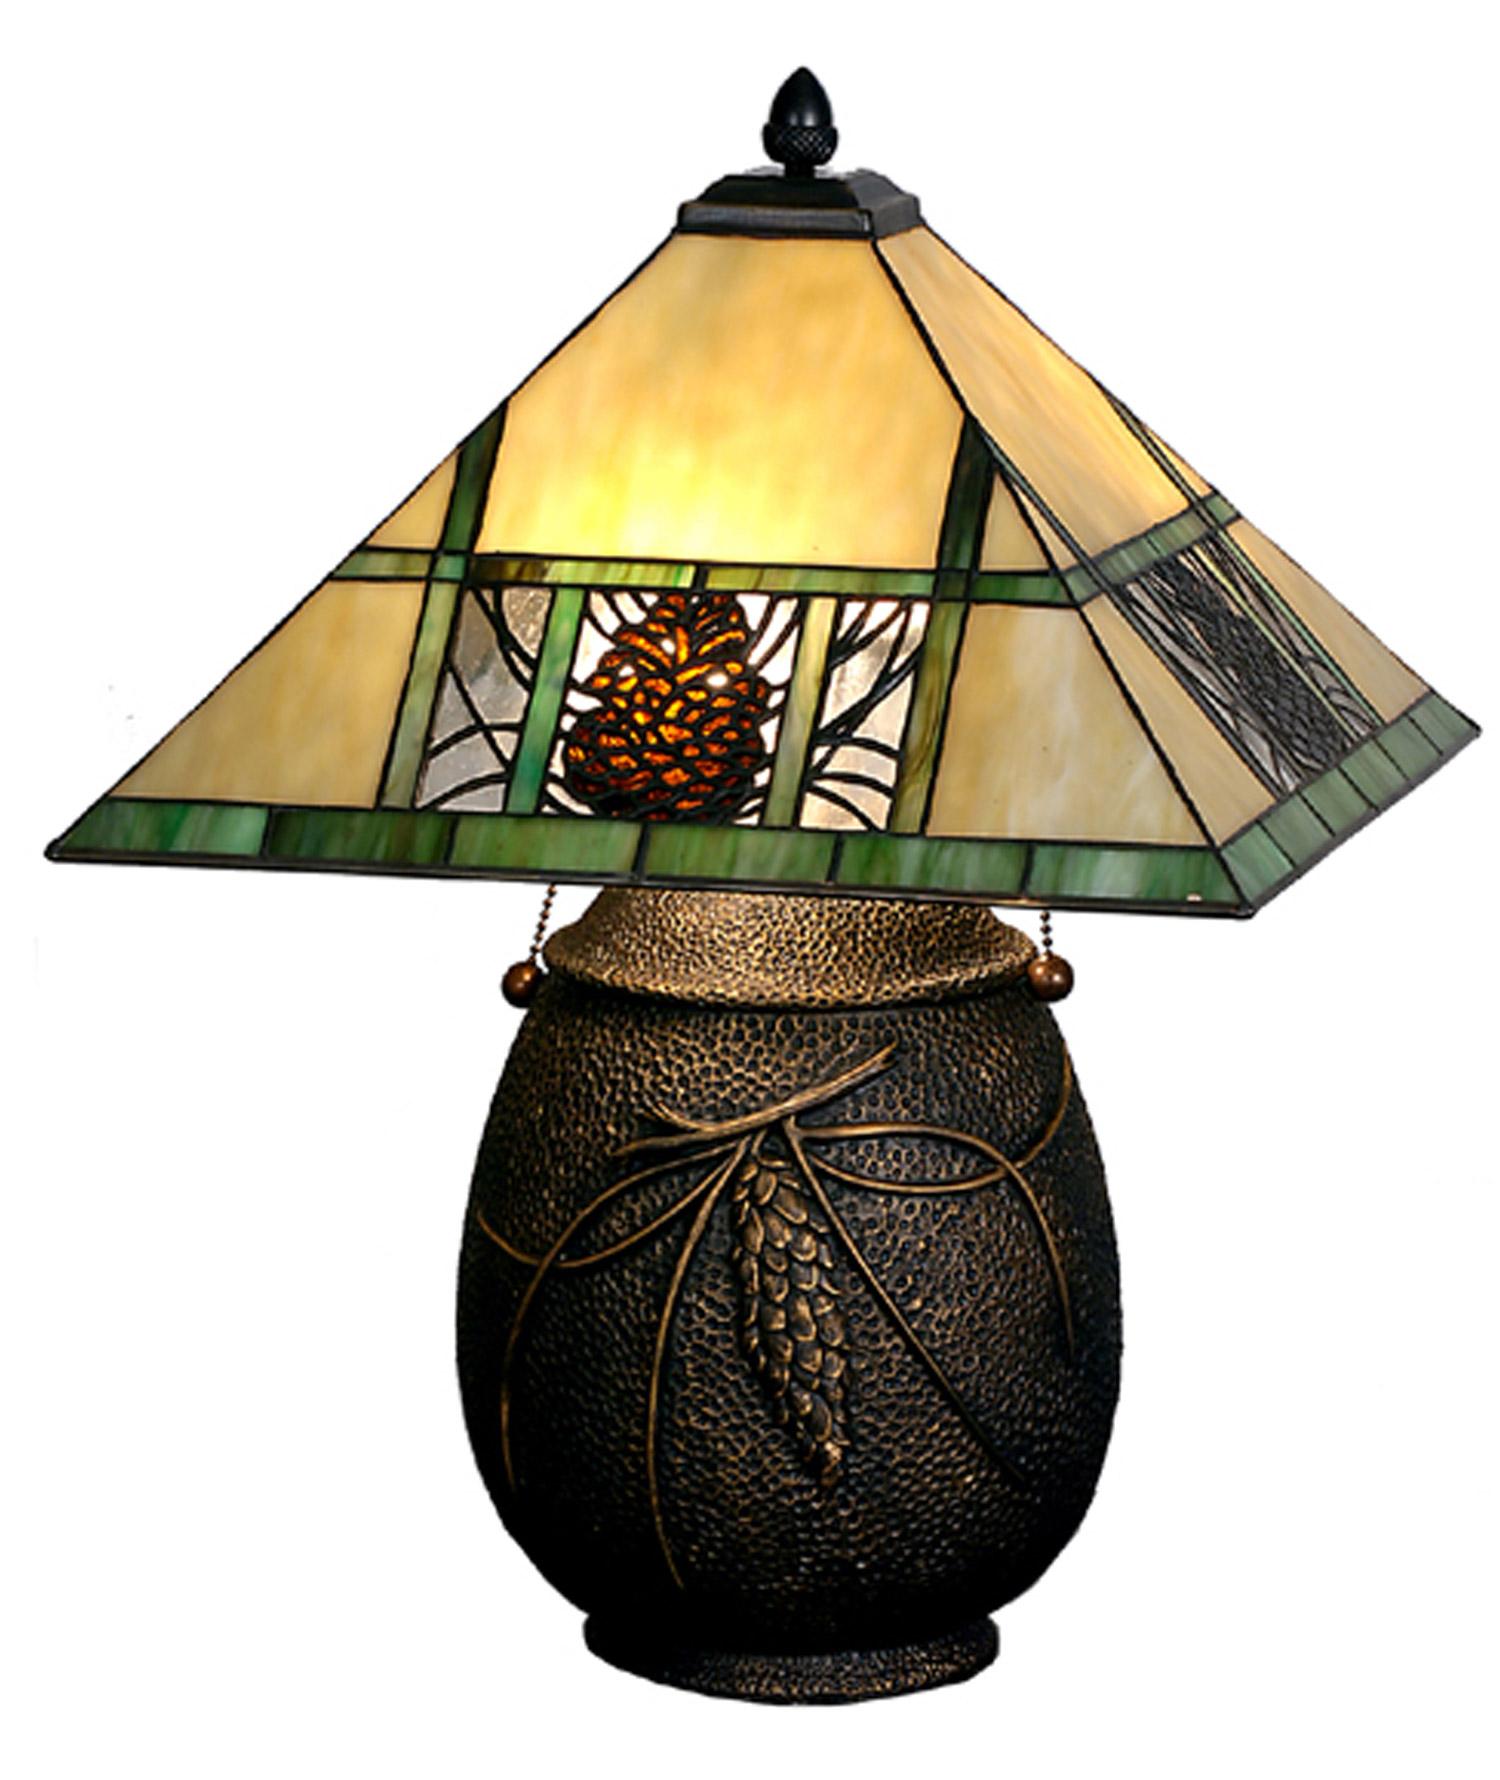 Meyda 67850 Pinecone Table Lamp